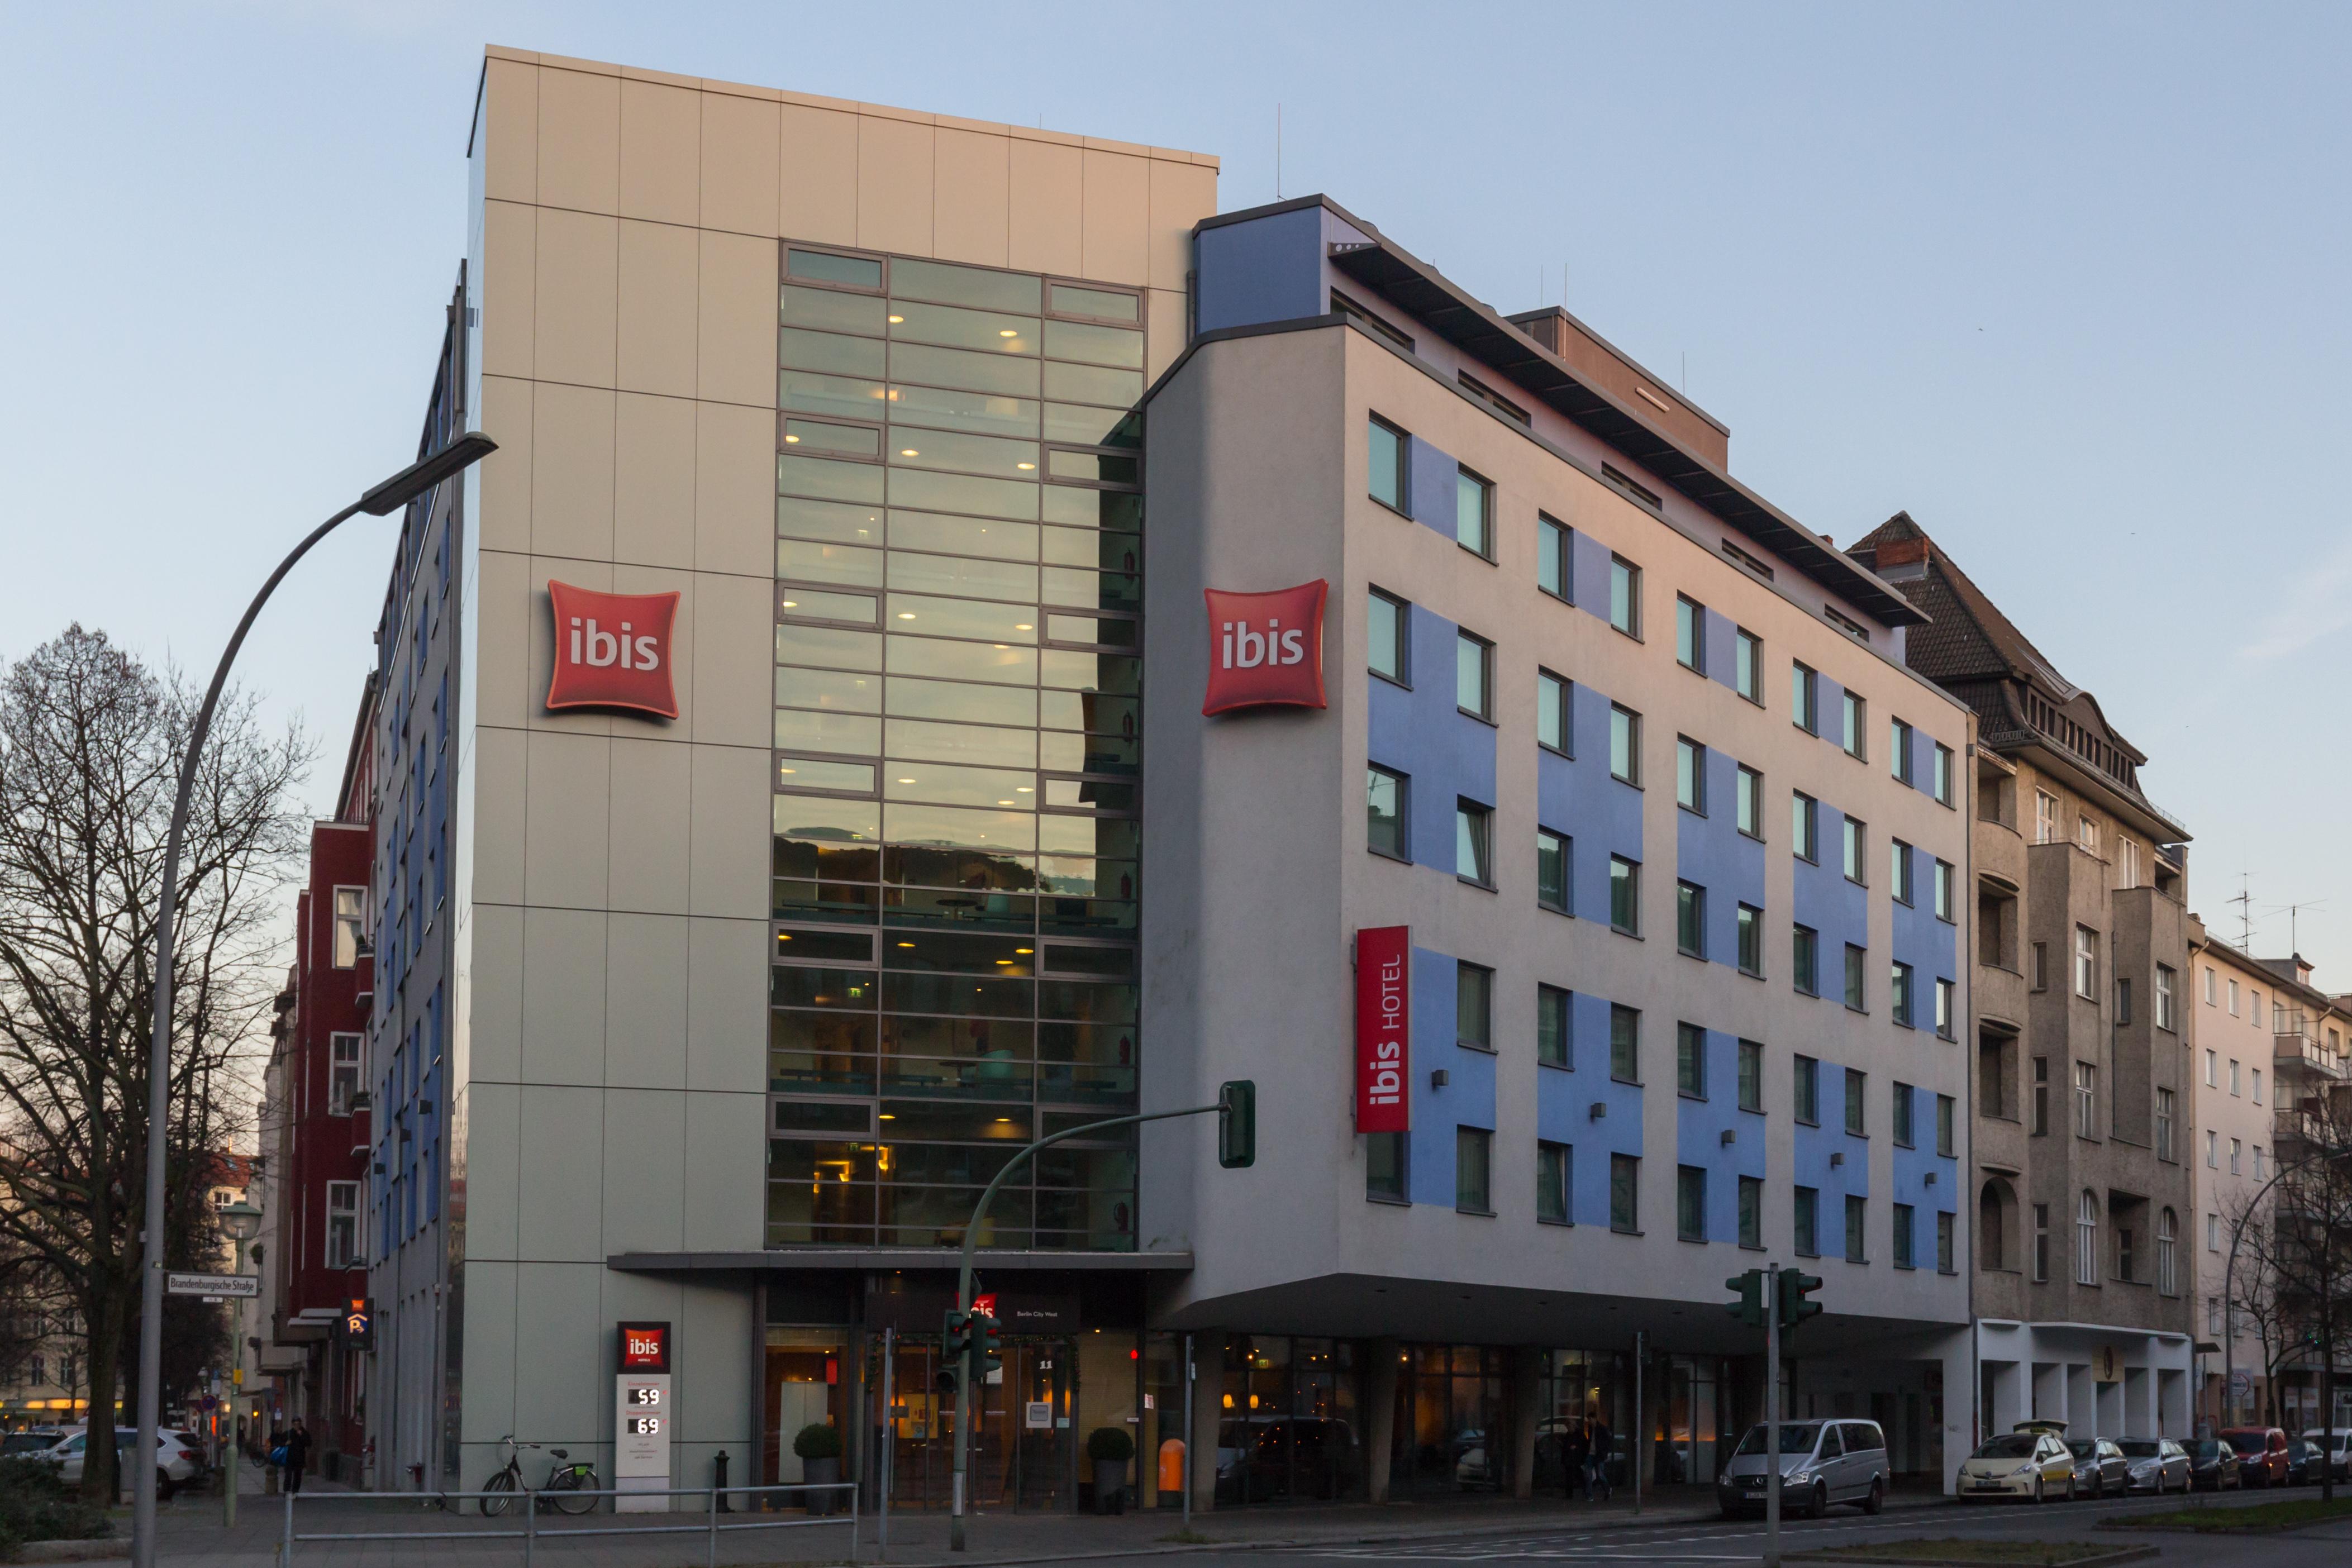 Datei Ibis Hotel In Wilmersdorf 20151219 25 Jpg Wikipedia